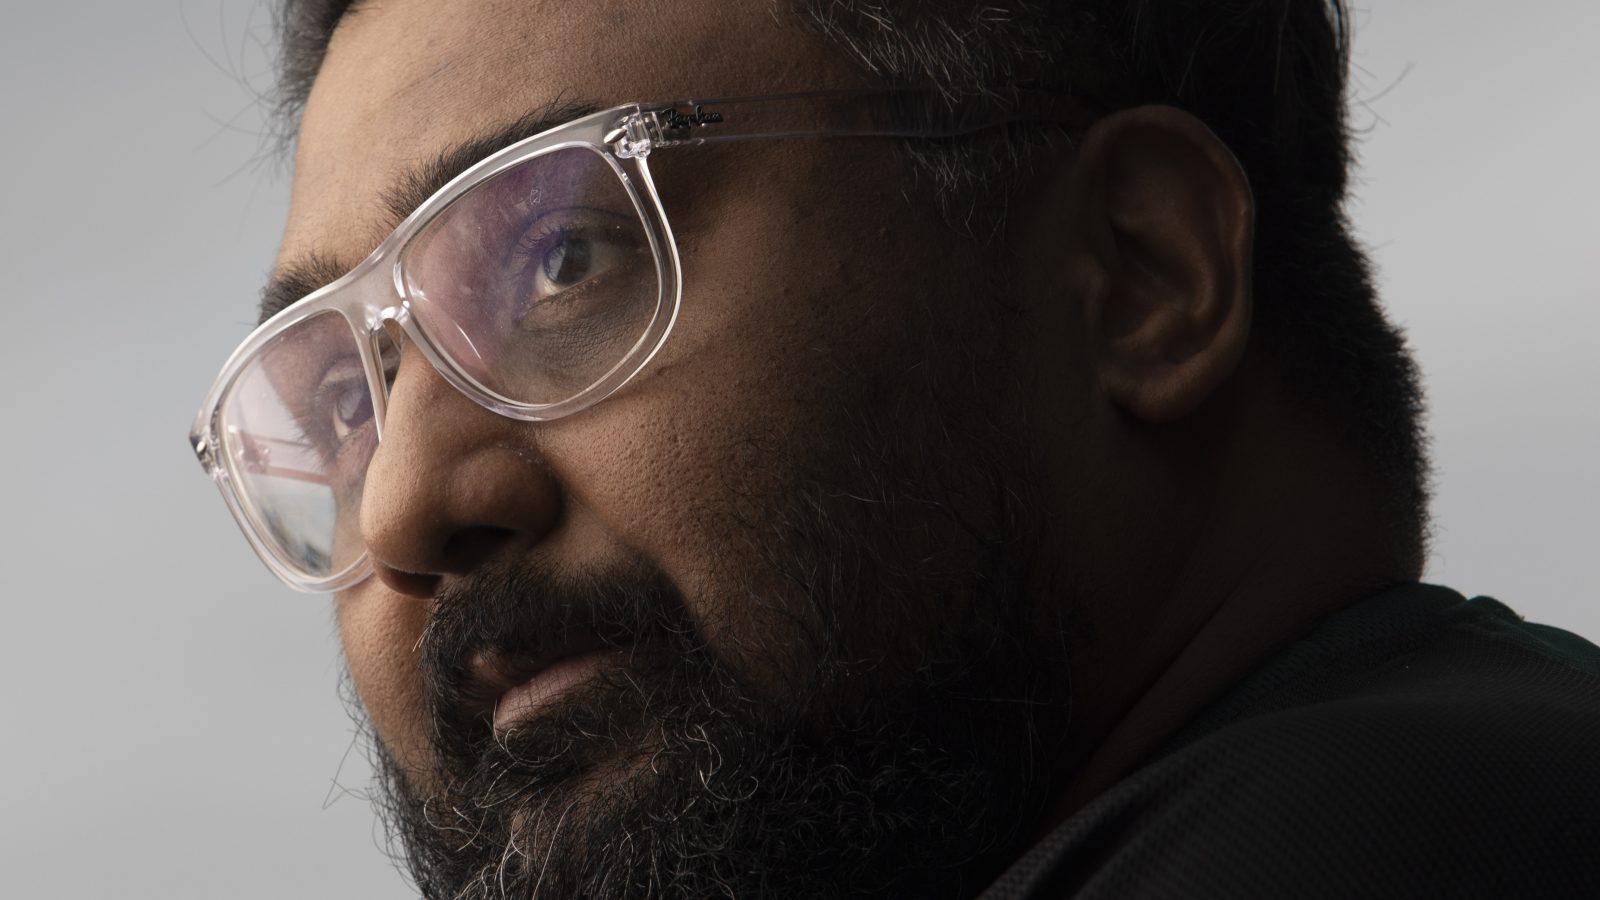 Kunal Shah says Big Tech has India all wrong